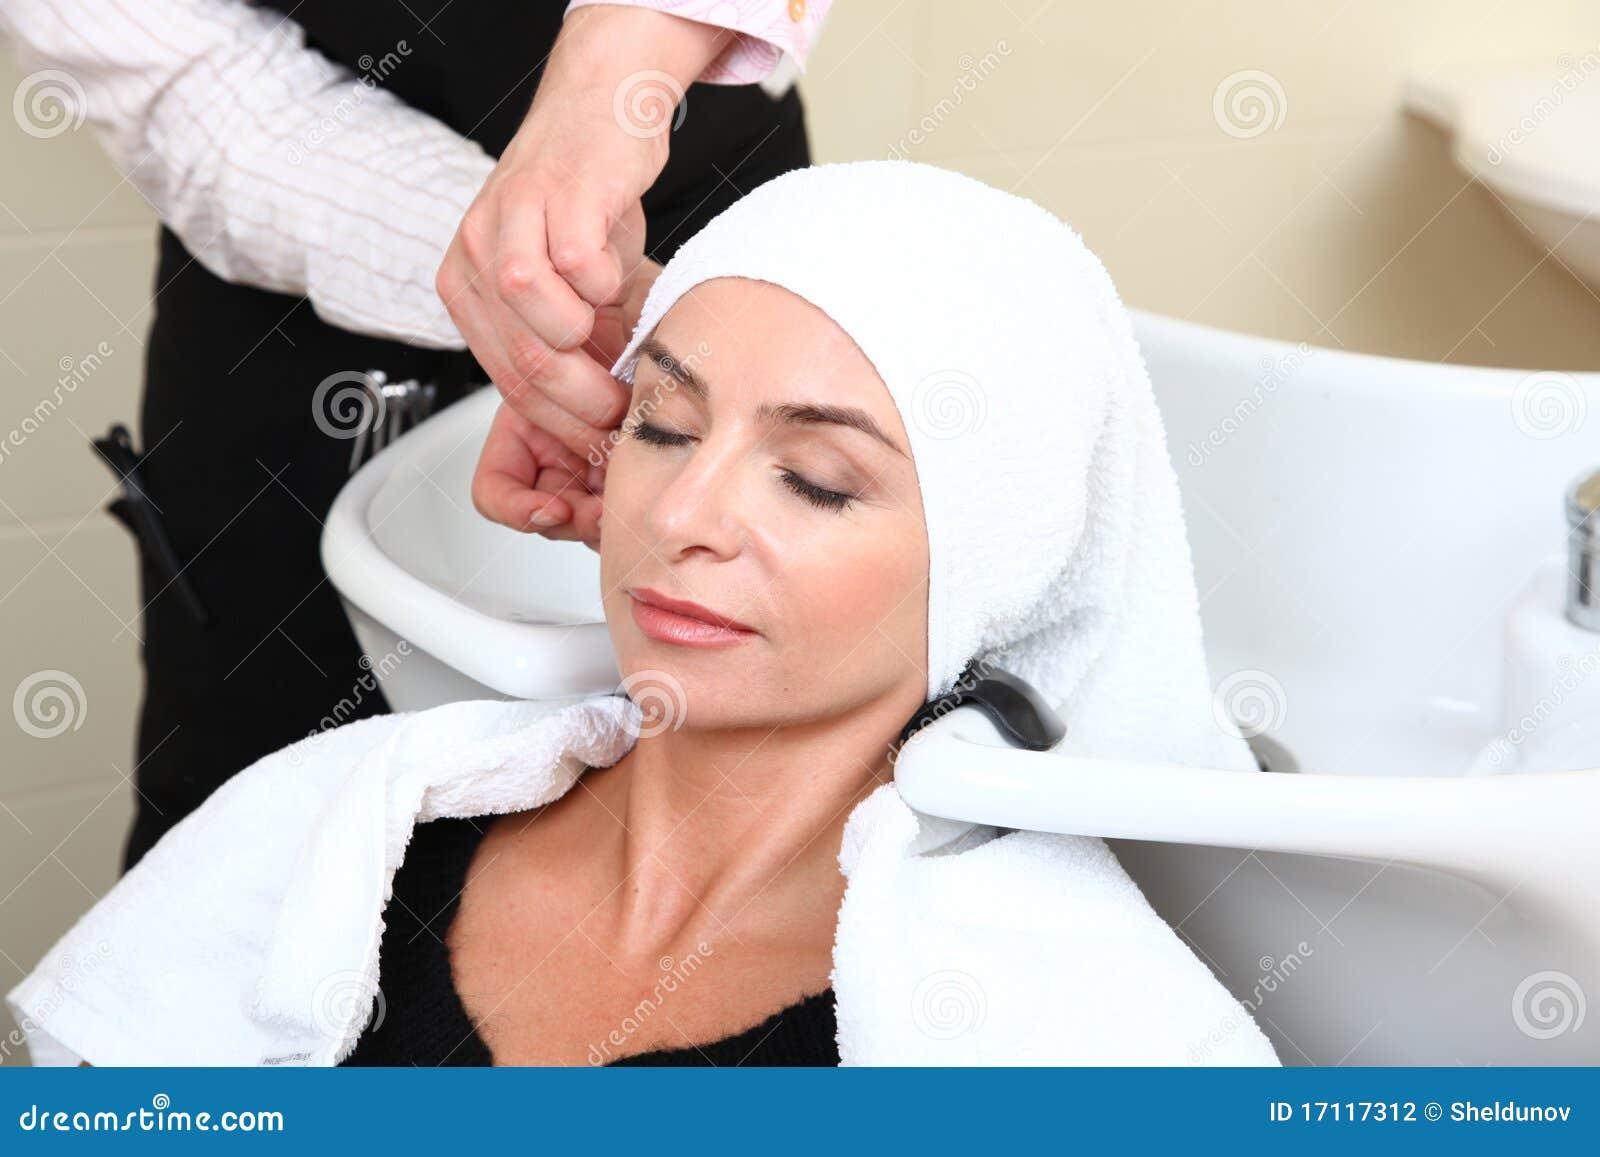 Woman washing hair in salon pool stock photo image 17117312 for Wash hair salon